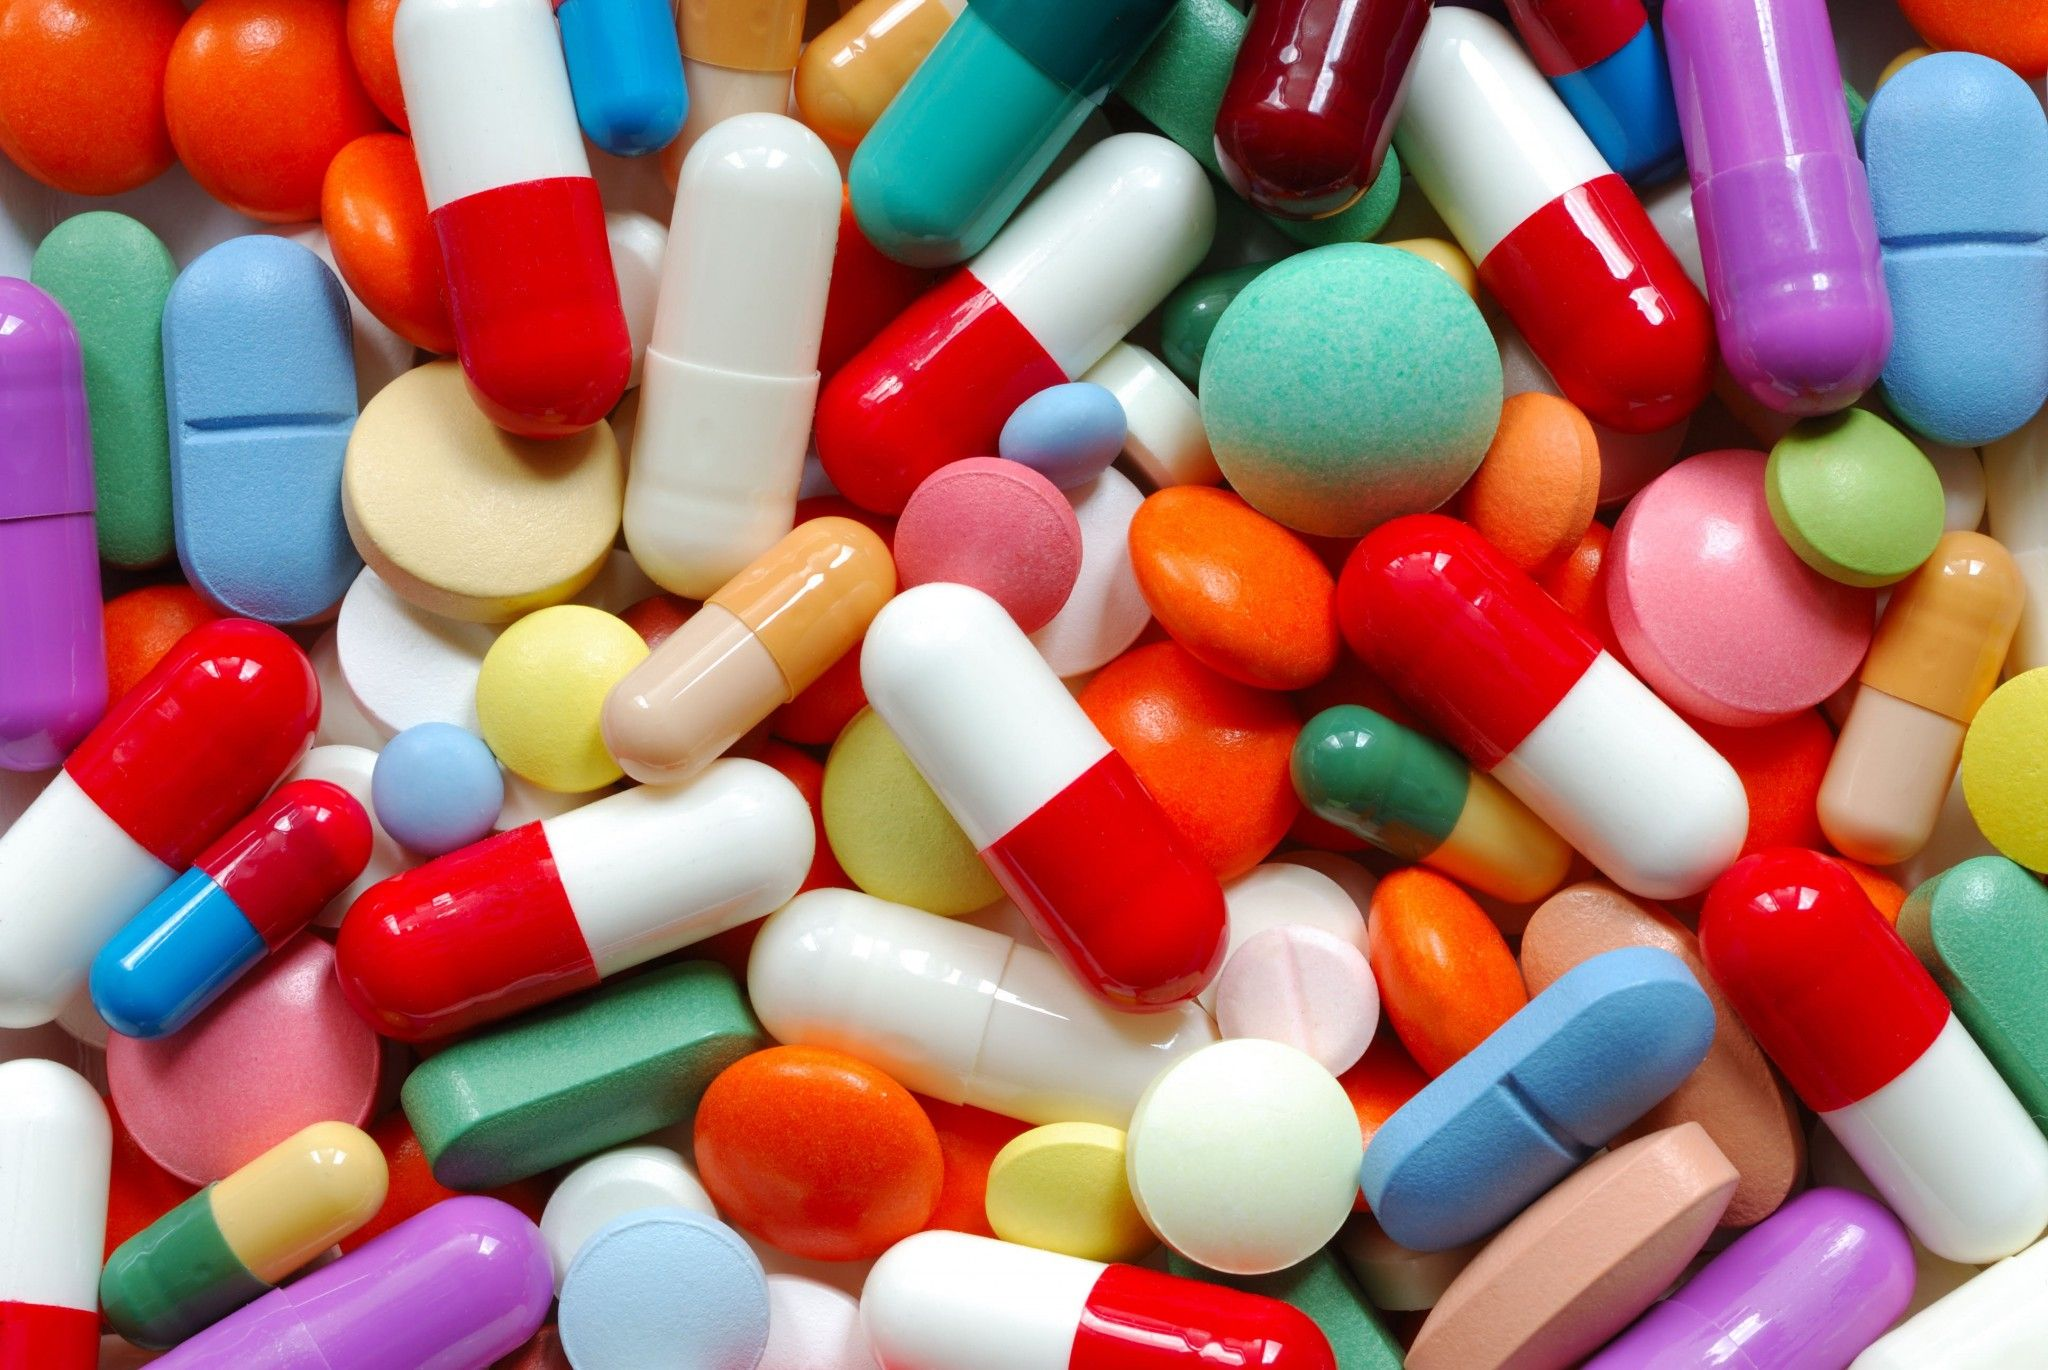 Pin By Sladjana On Pills Pinterest Pharmacy Drugs And Medicine